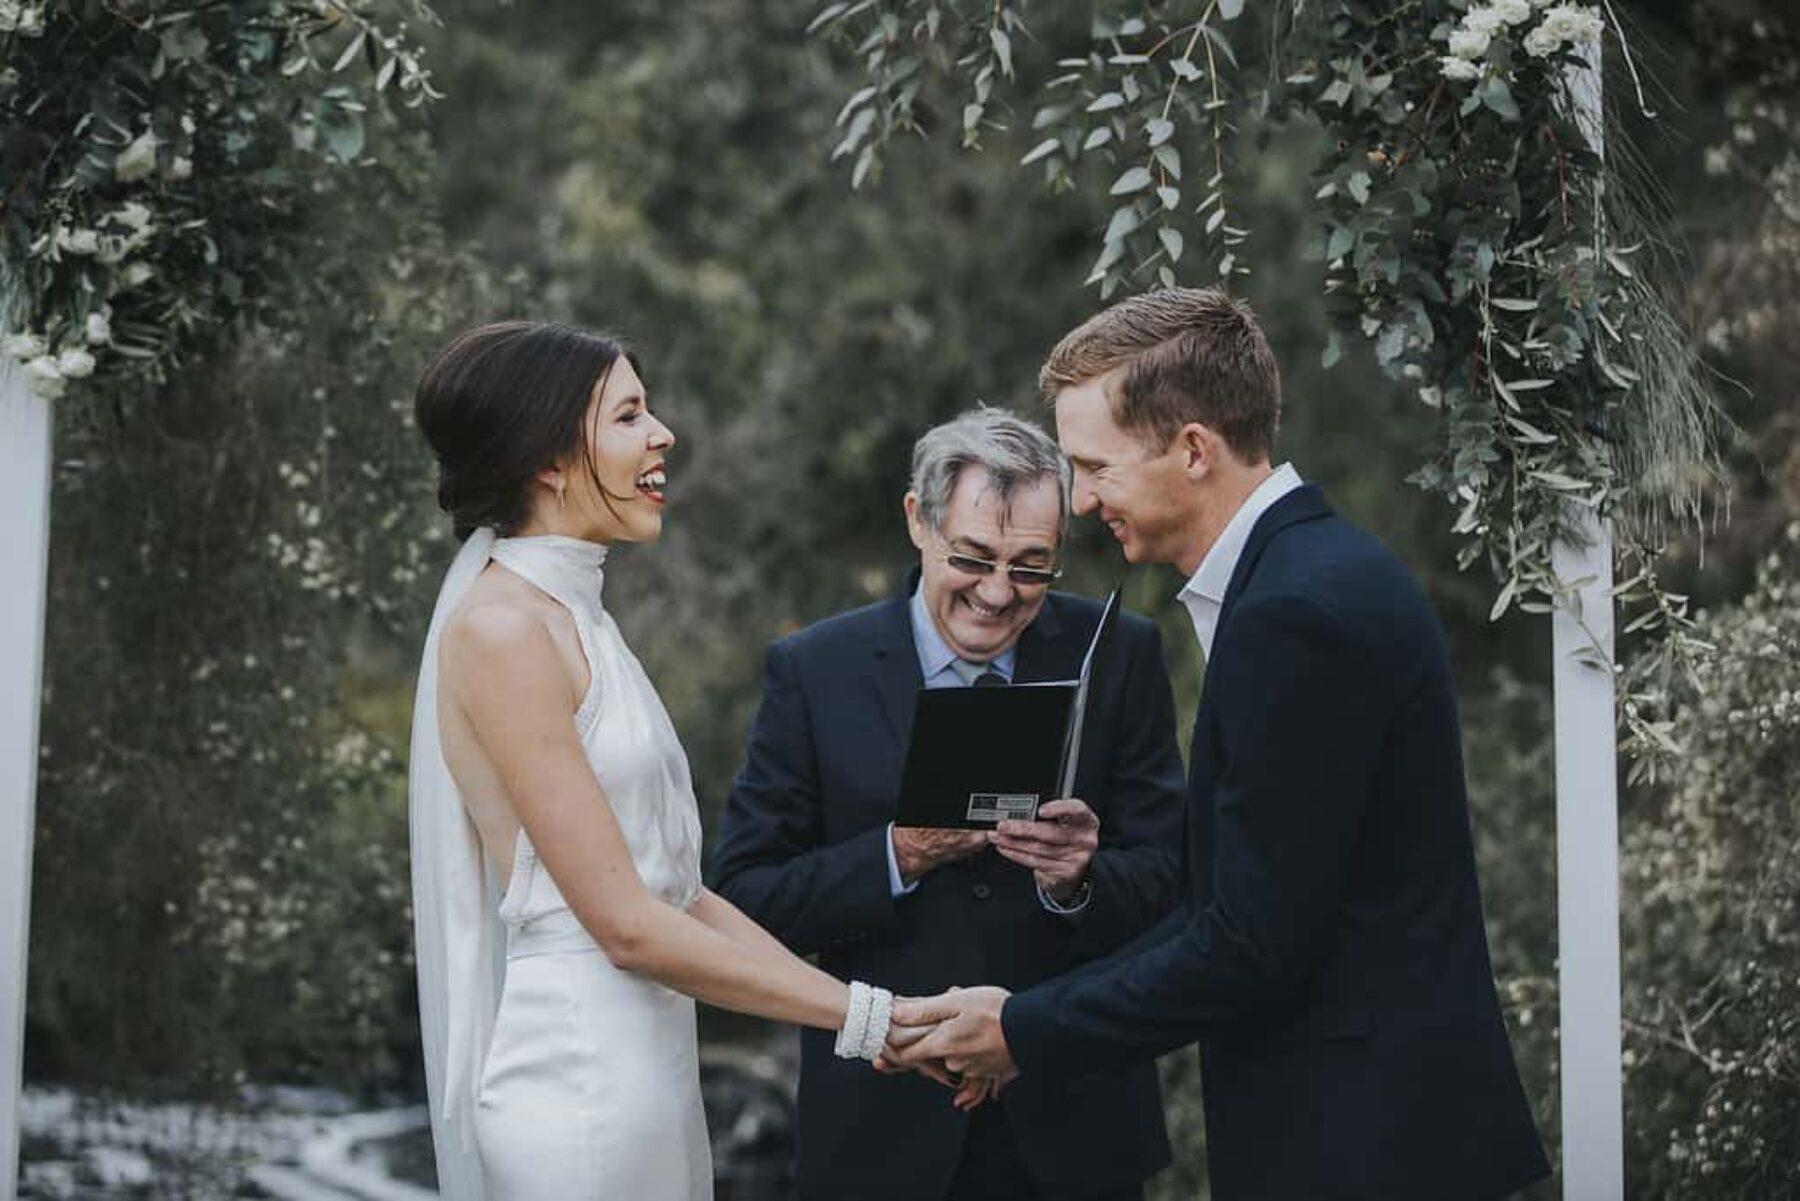 Stylish Pemberton wedding by Keeper Creative Photography